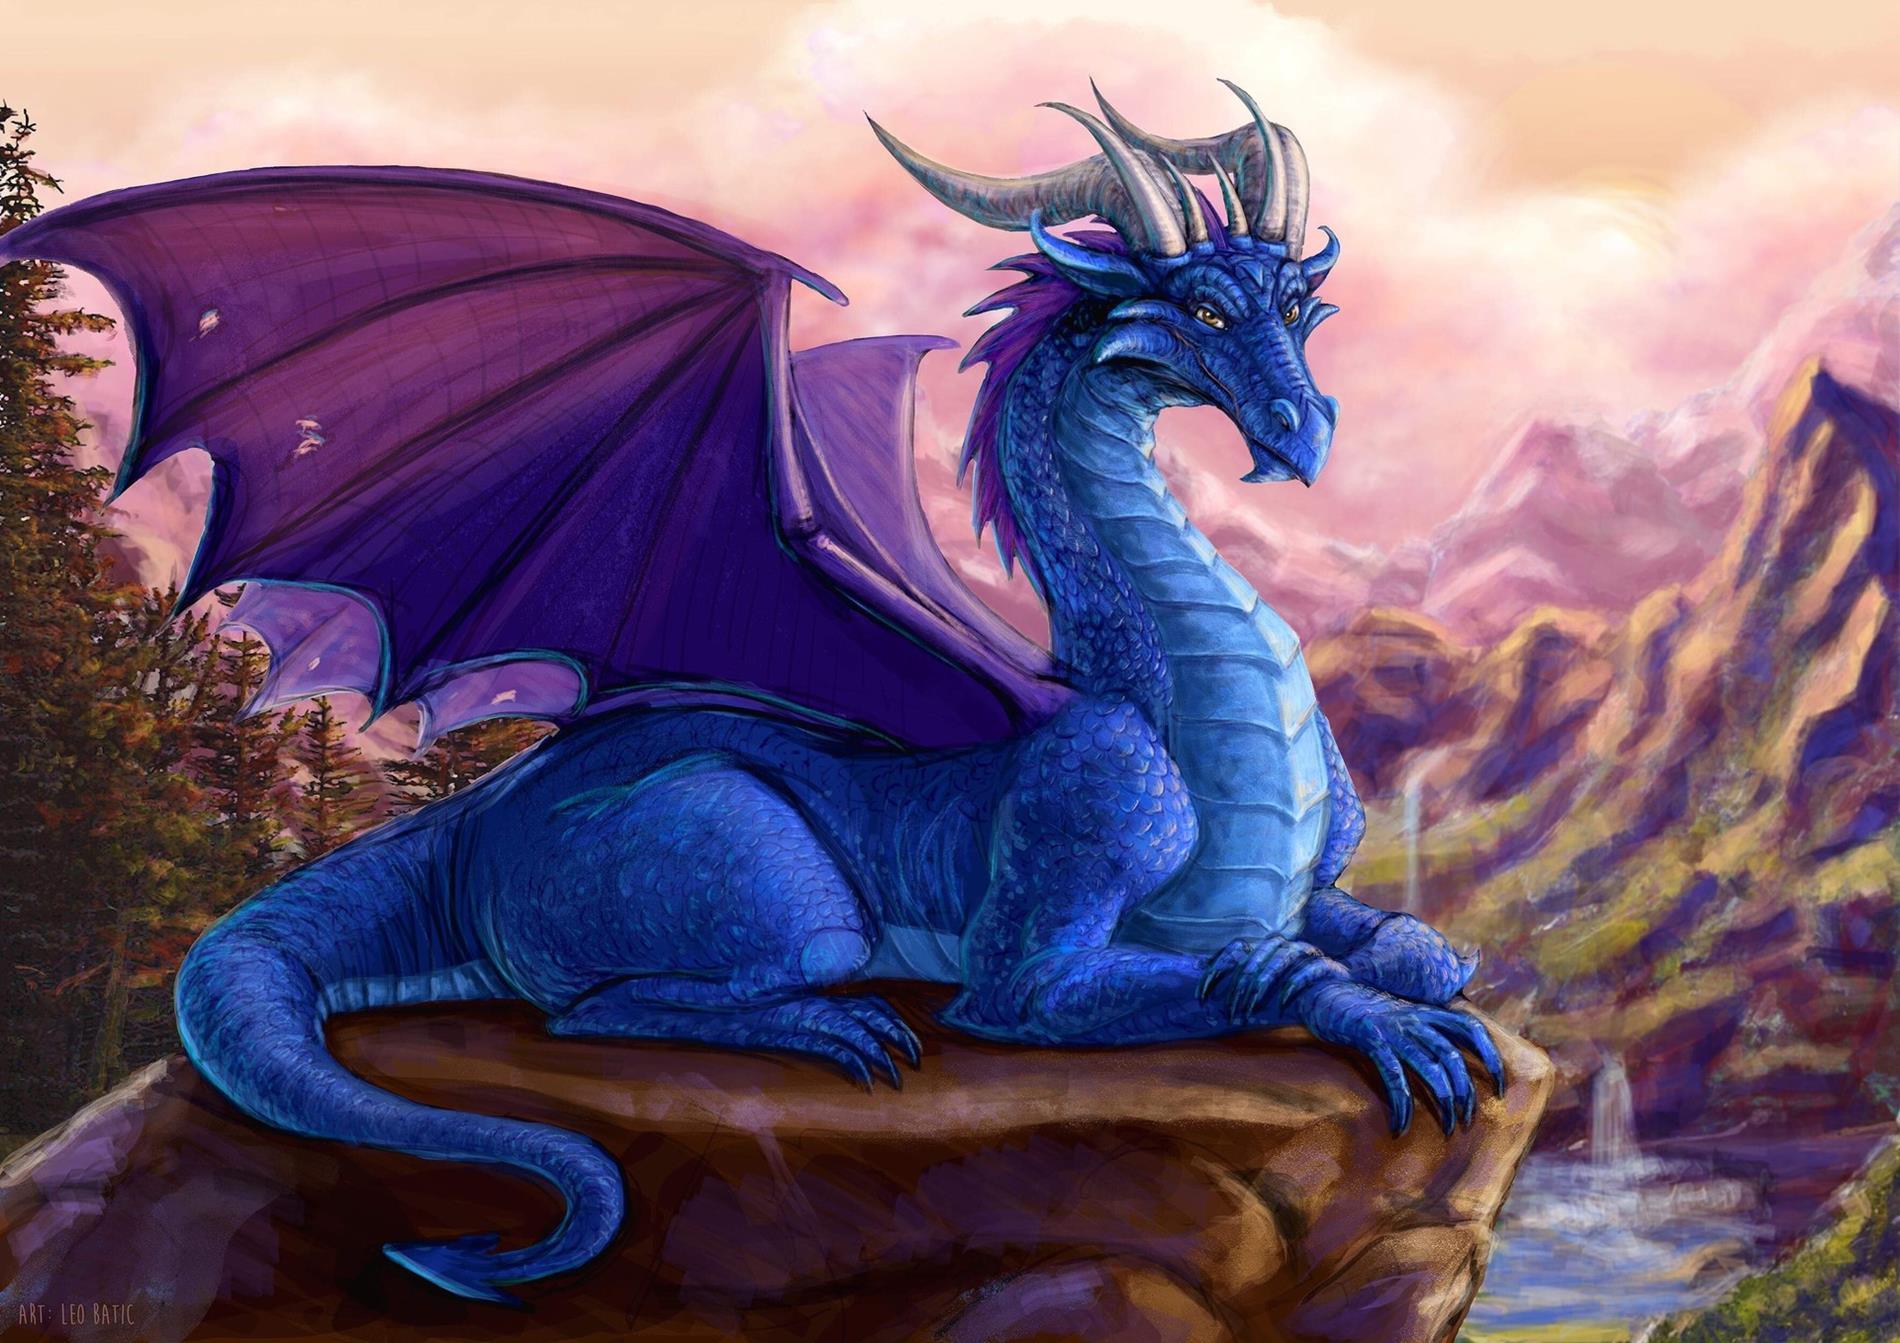 Blue Dragon Designed by Leo Batic